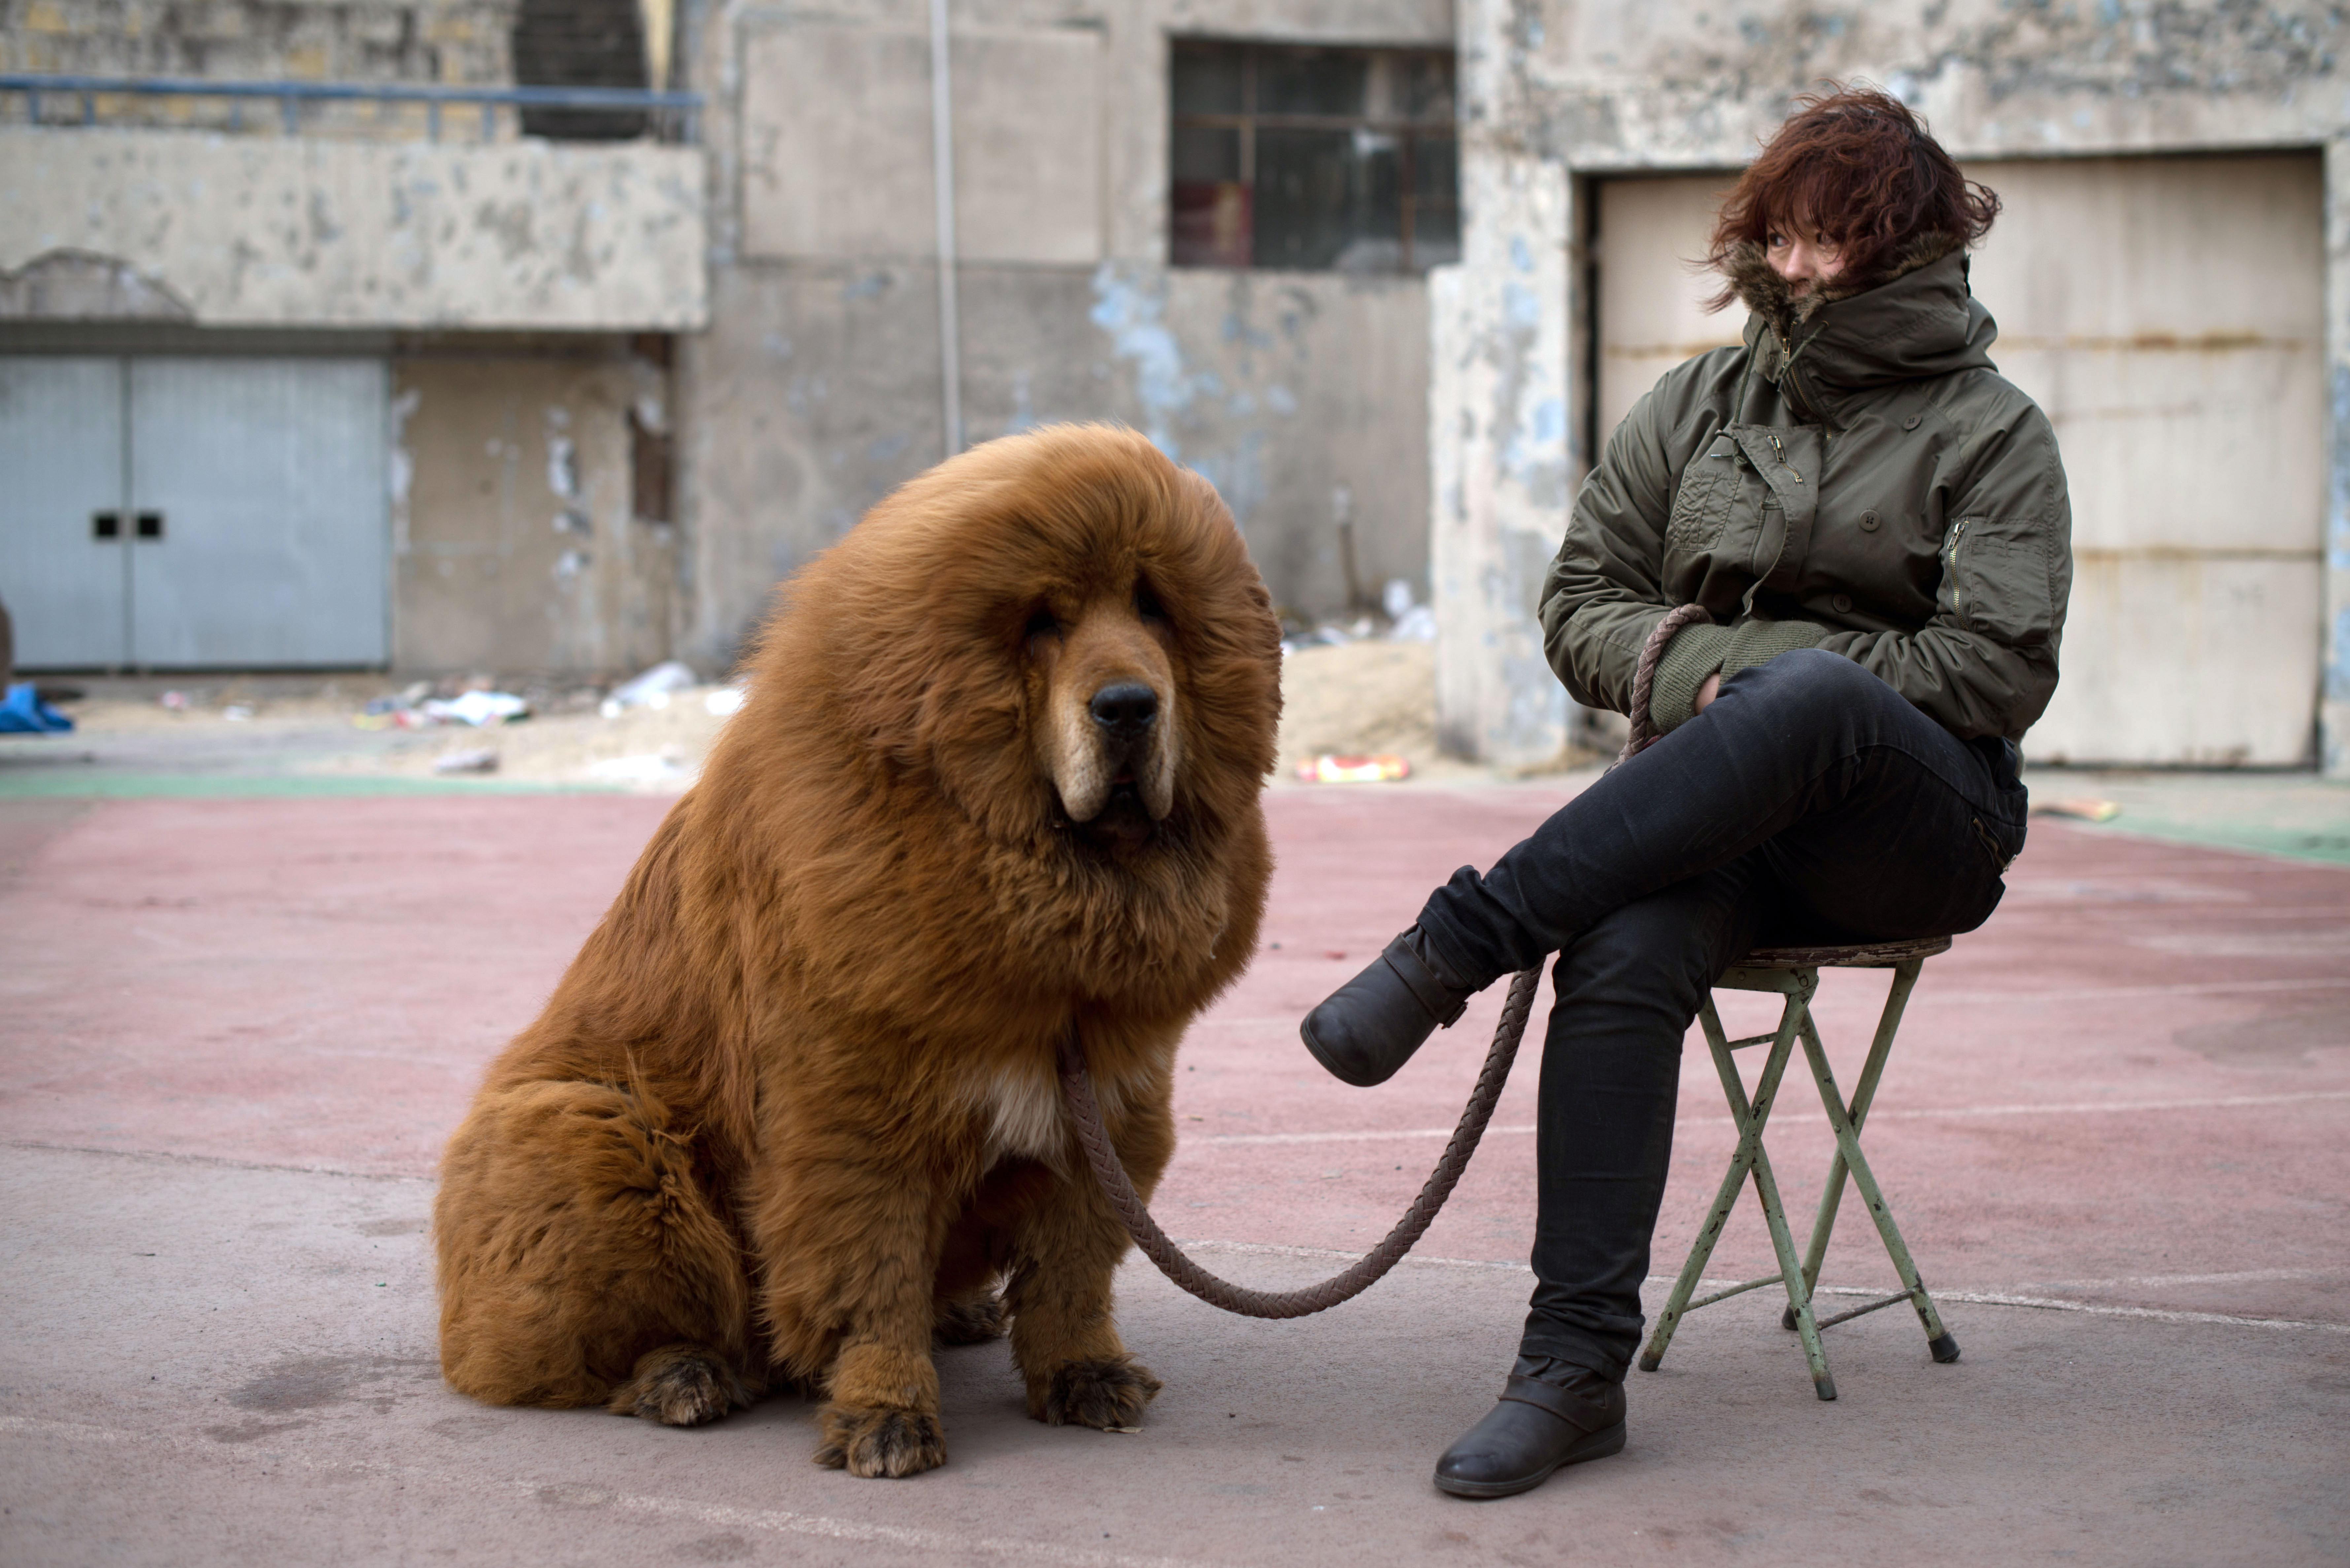 Tibetan mastiff size and weight www galleryhip com the hippest pics